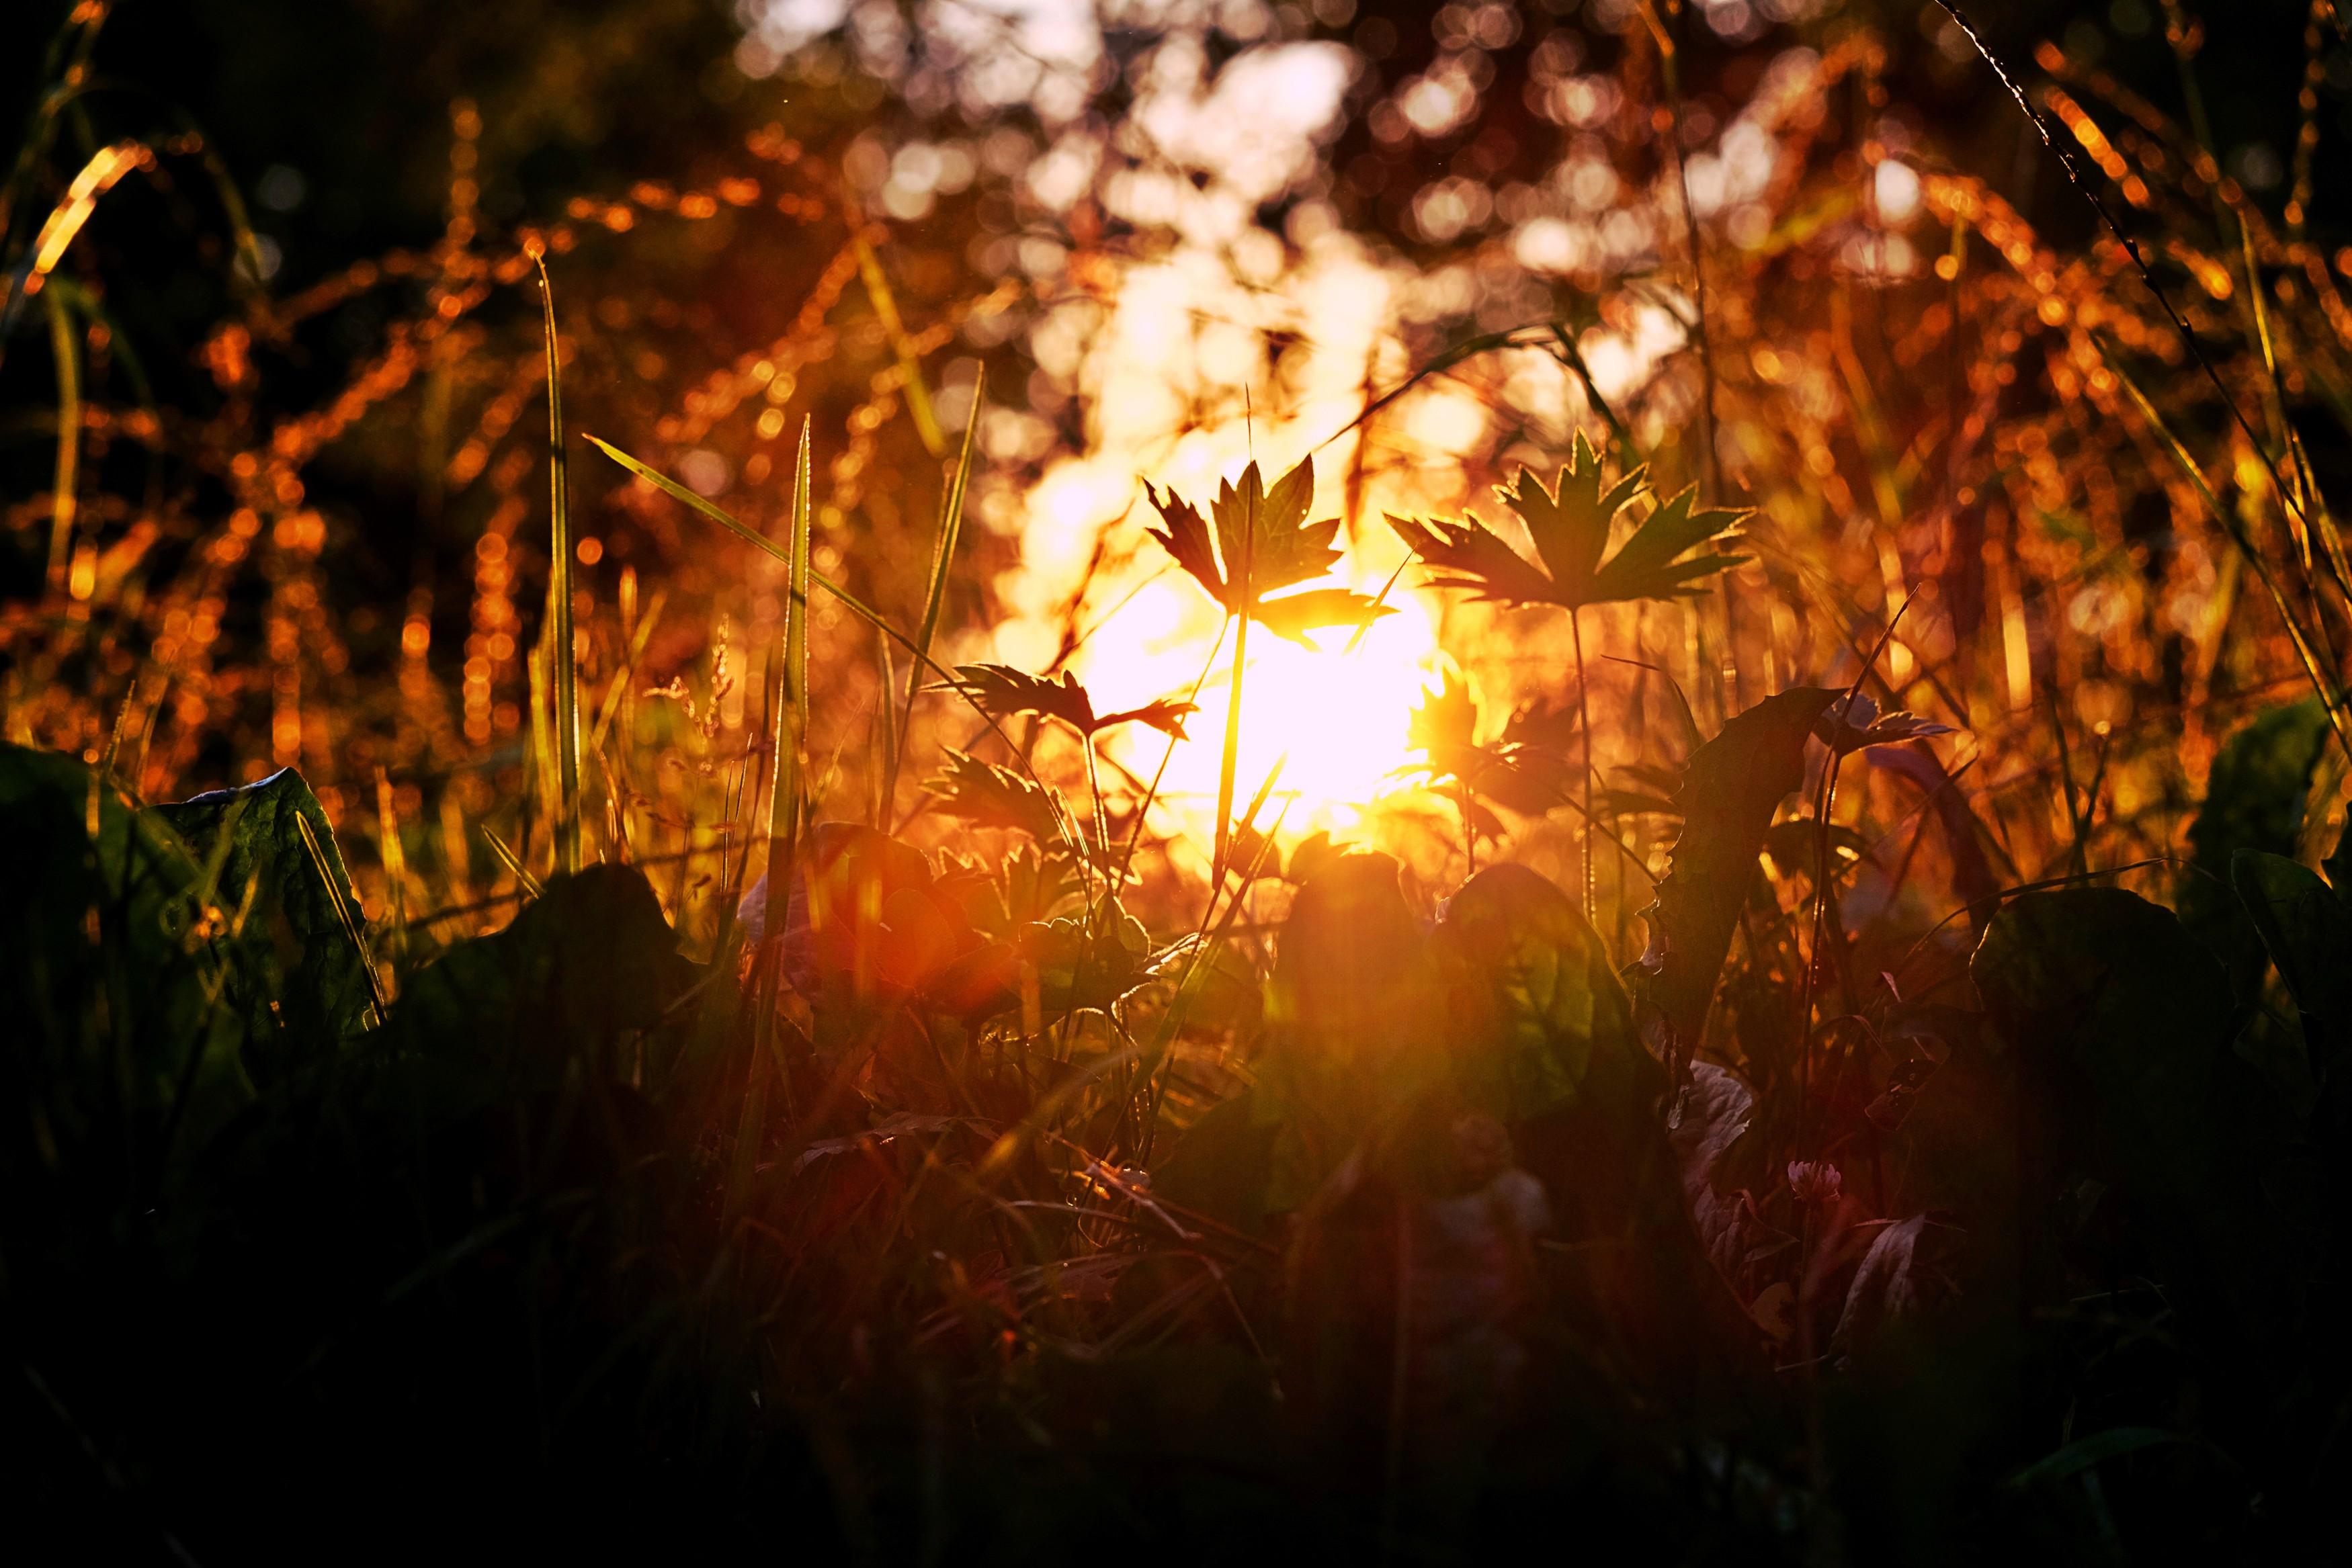 лучи солнца на траве картинки определитесь материалом